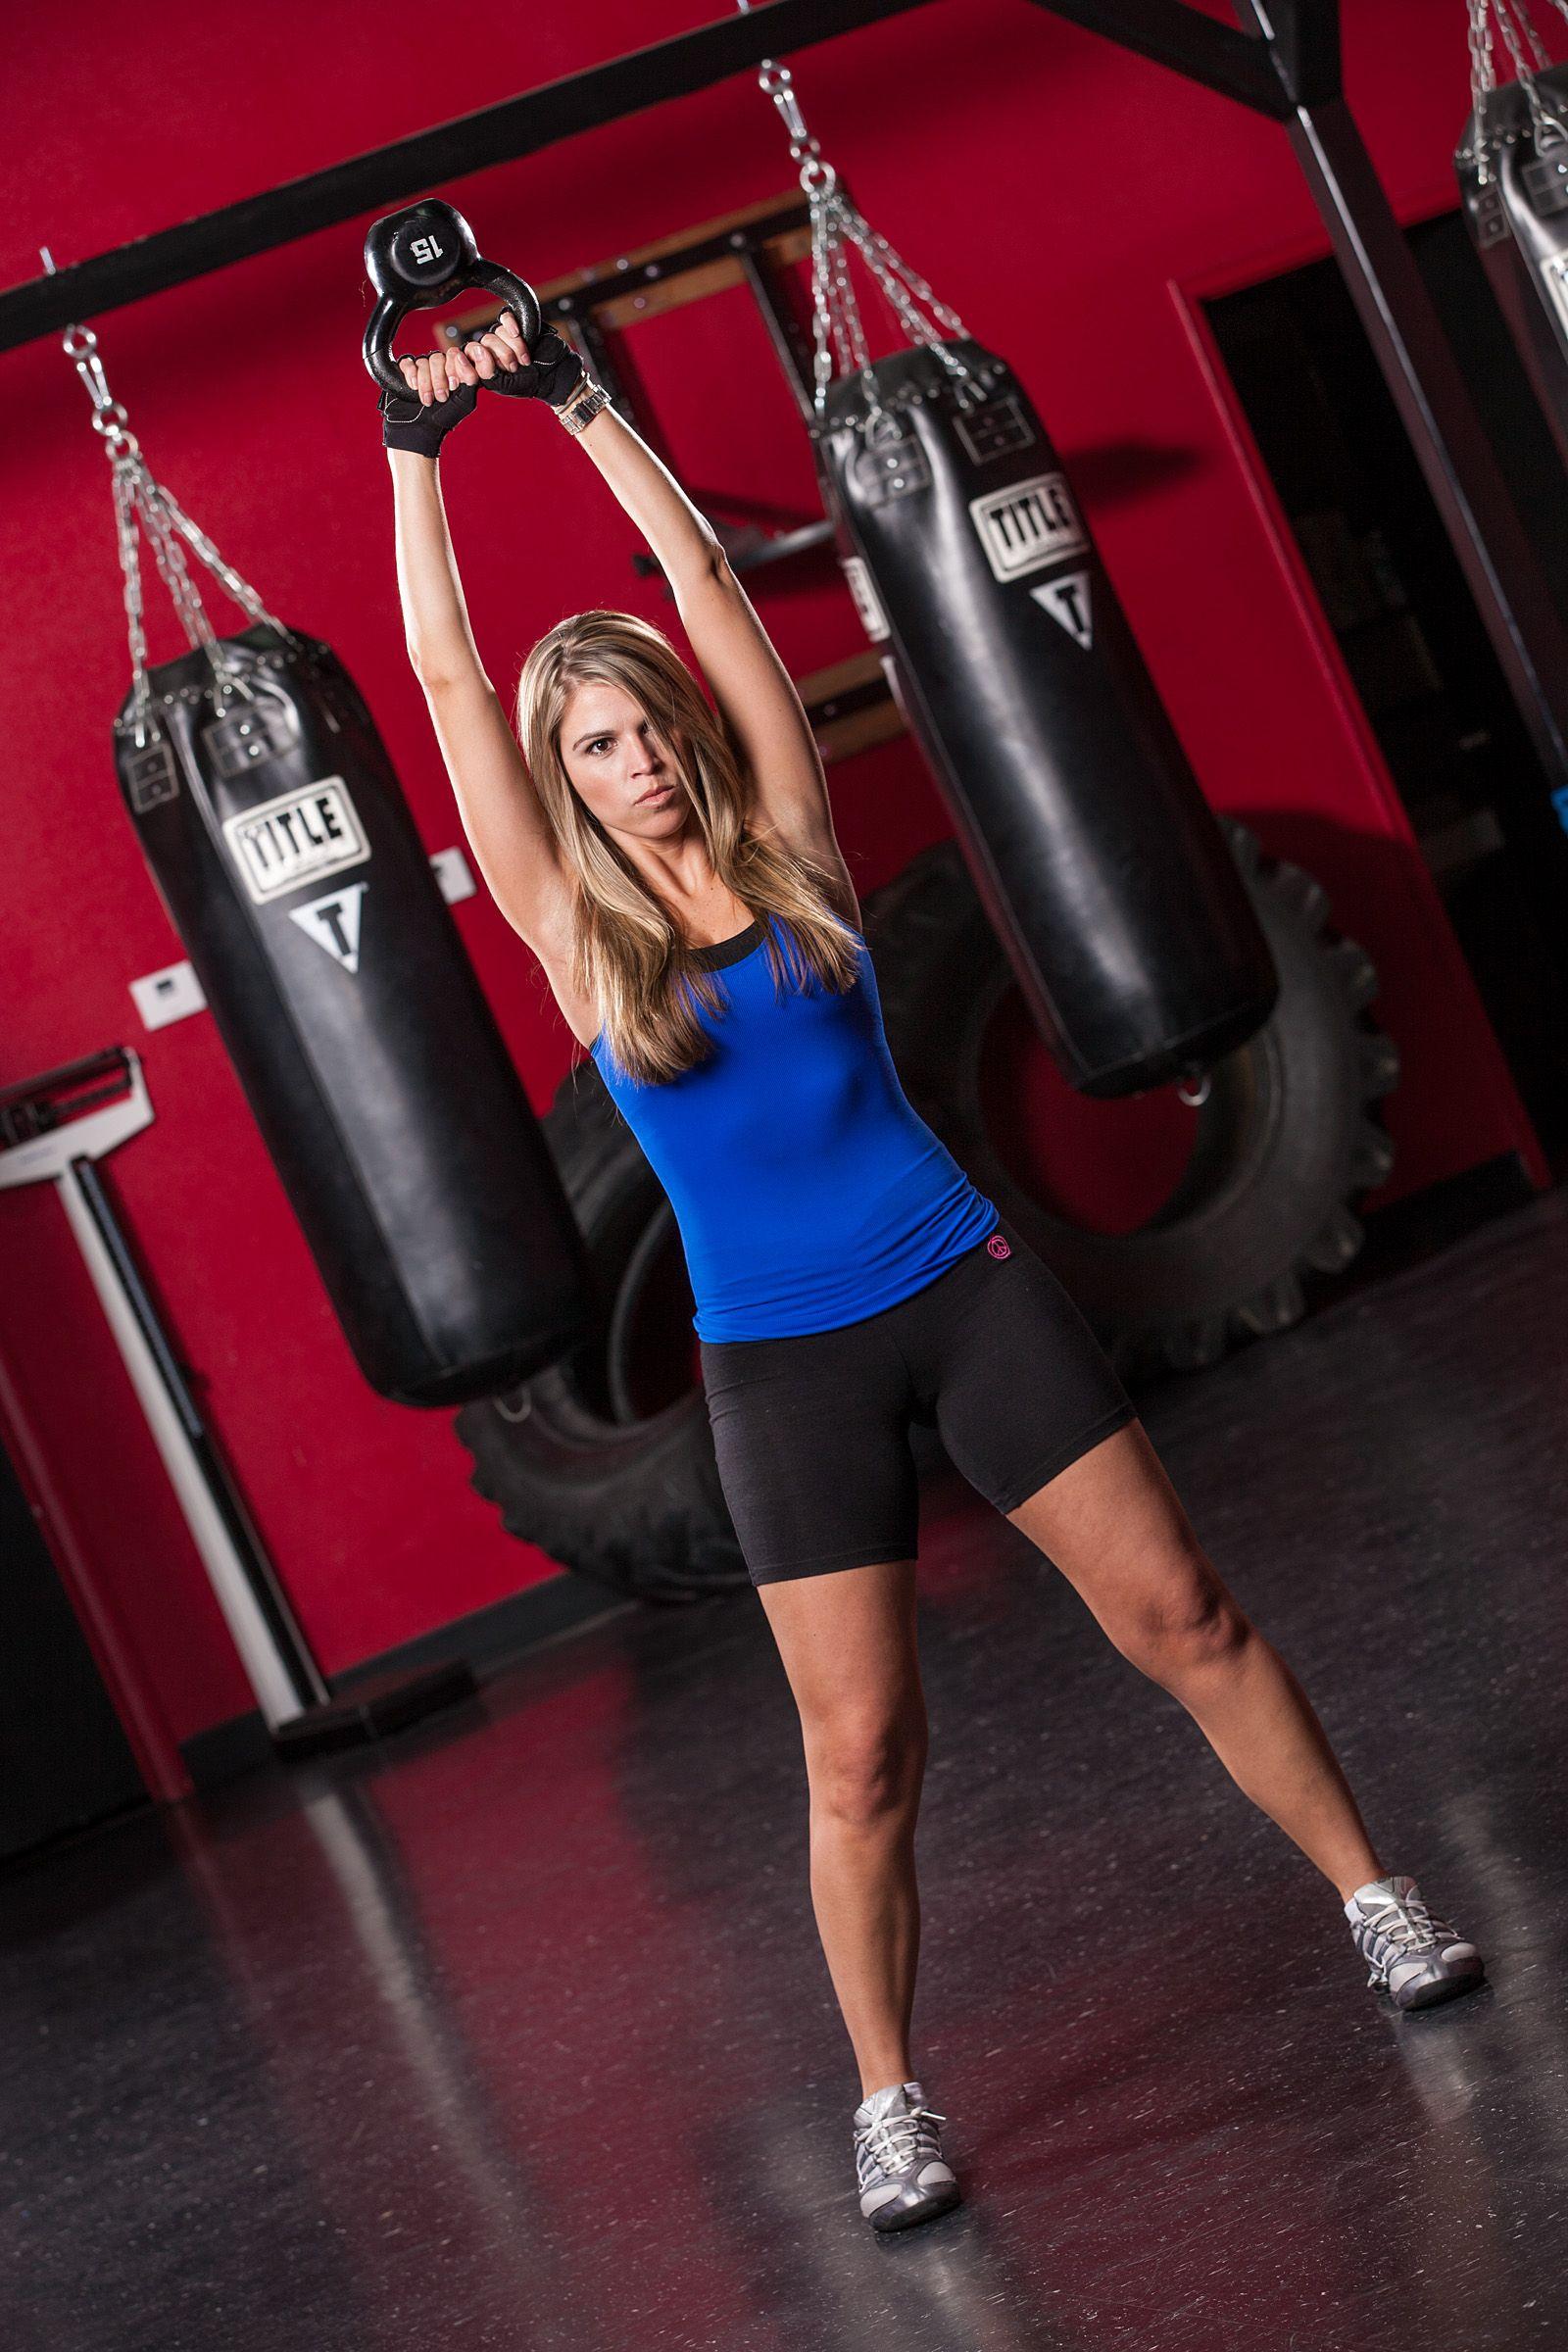 Boxing fitness StoneHard gym women personaltraining  Hit me